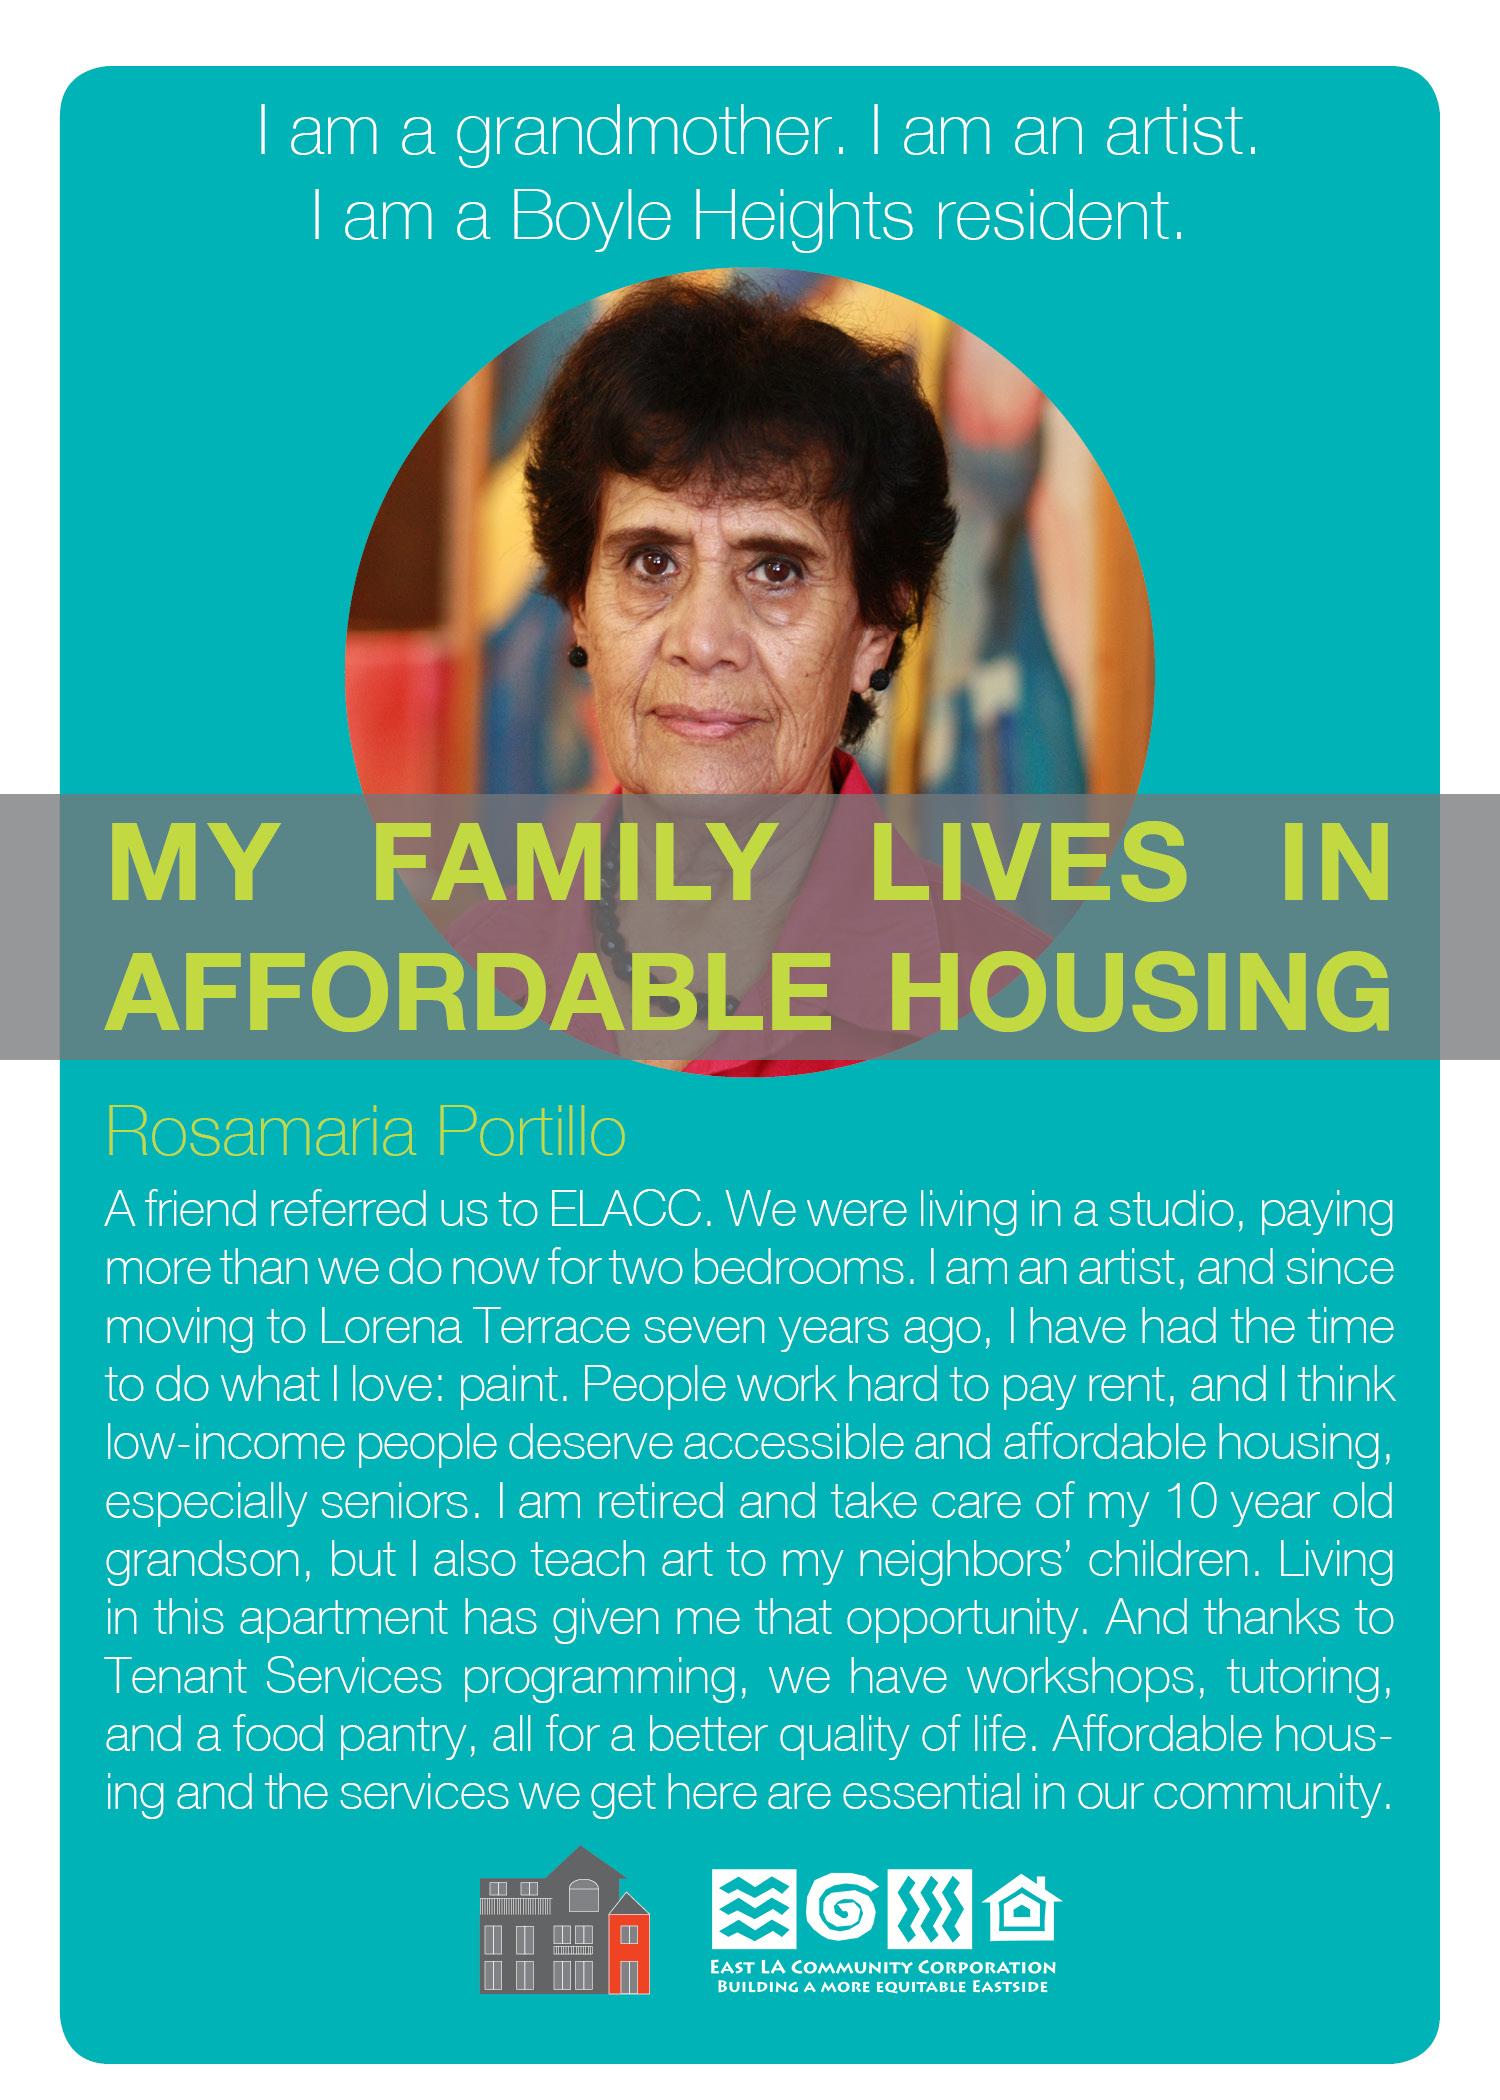 4_-_Live_in_Affordable_Housing-Rosamaria-_JPEG.jpg